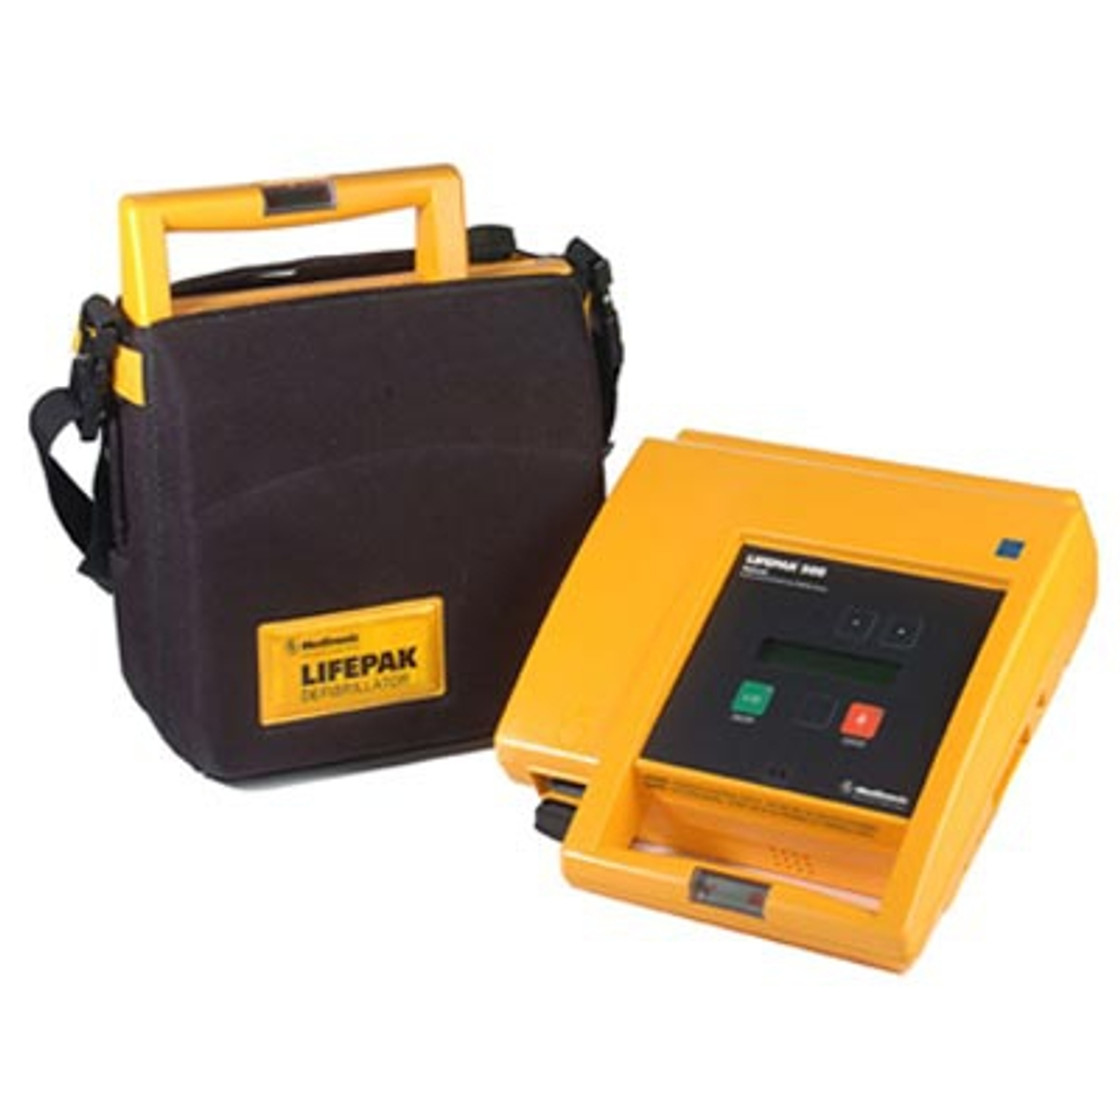 Physio-Control LIFEPAK 500